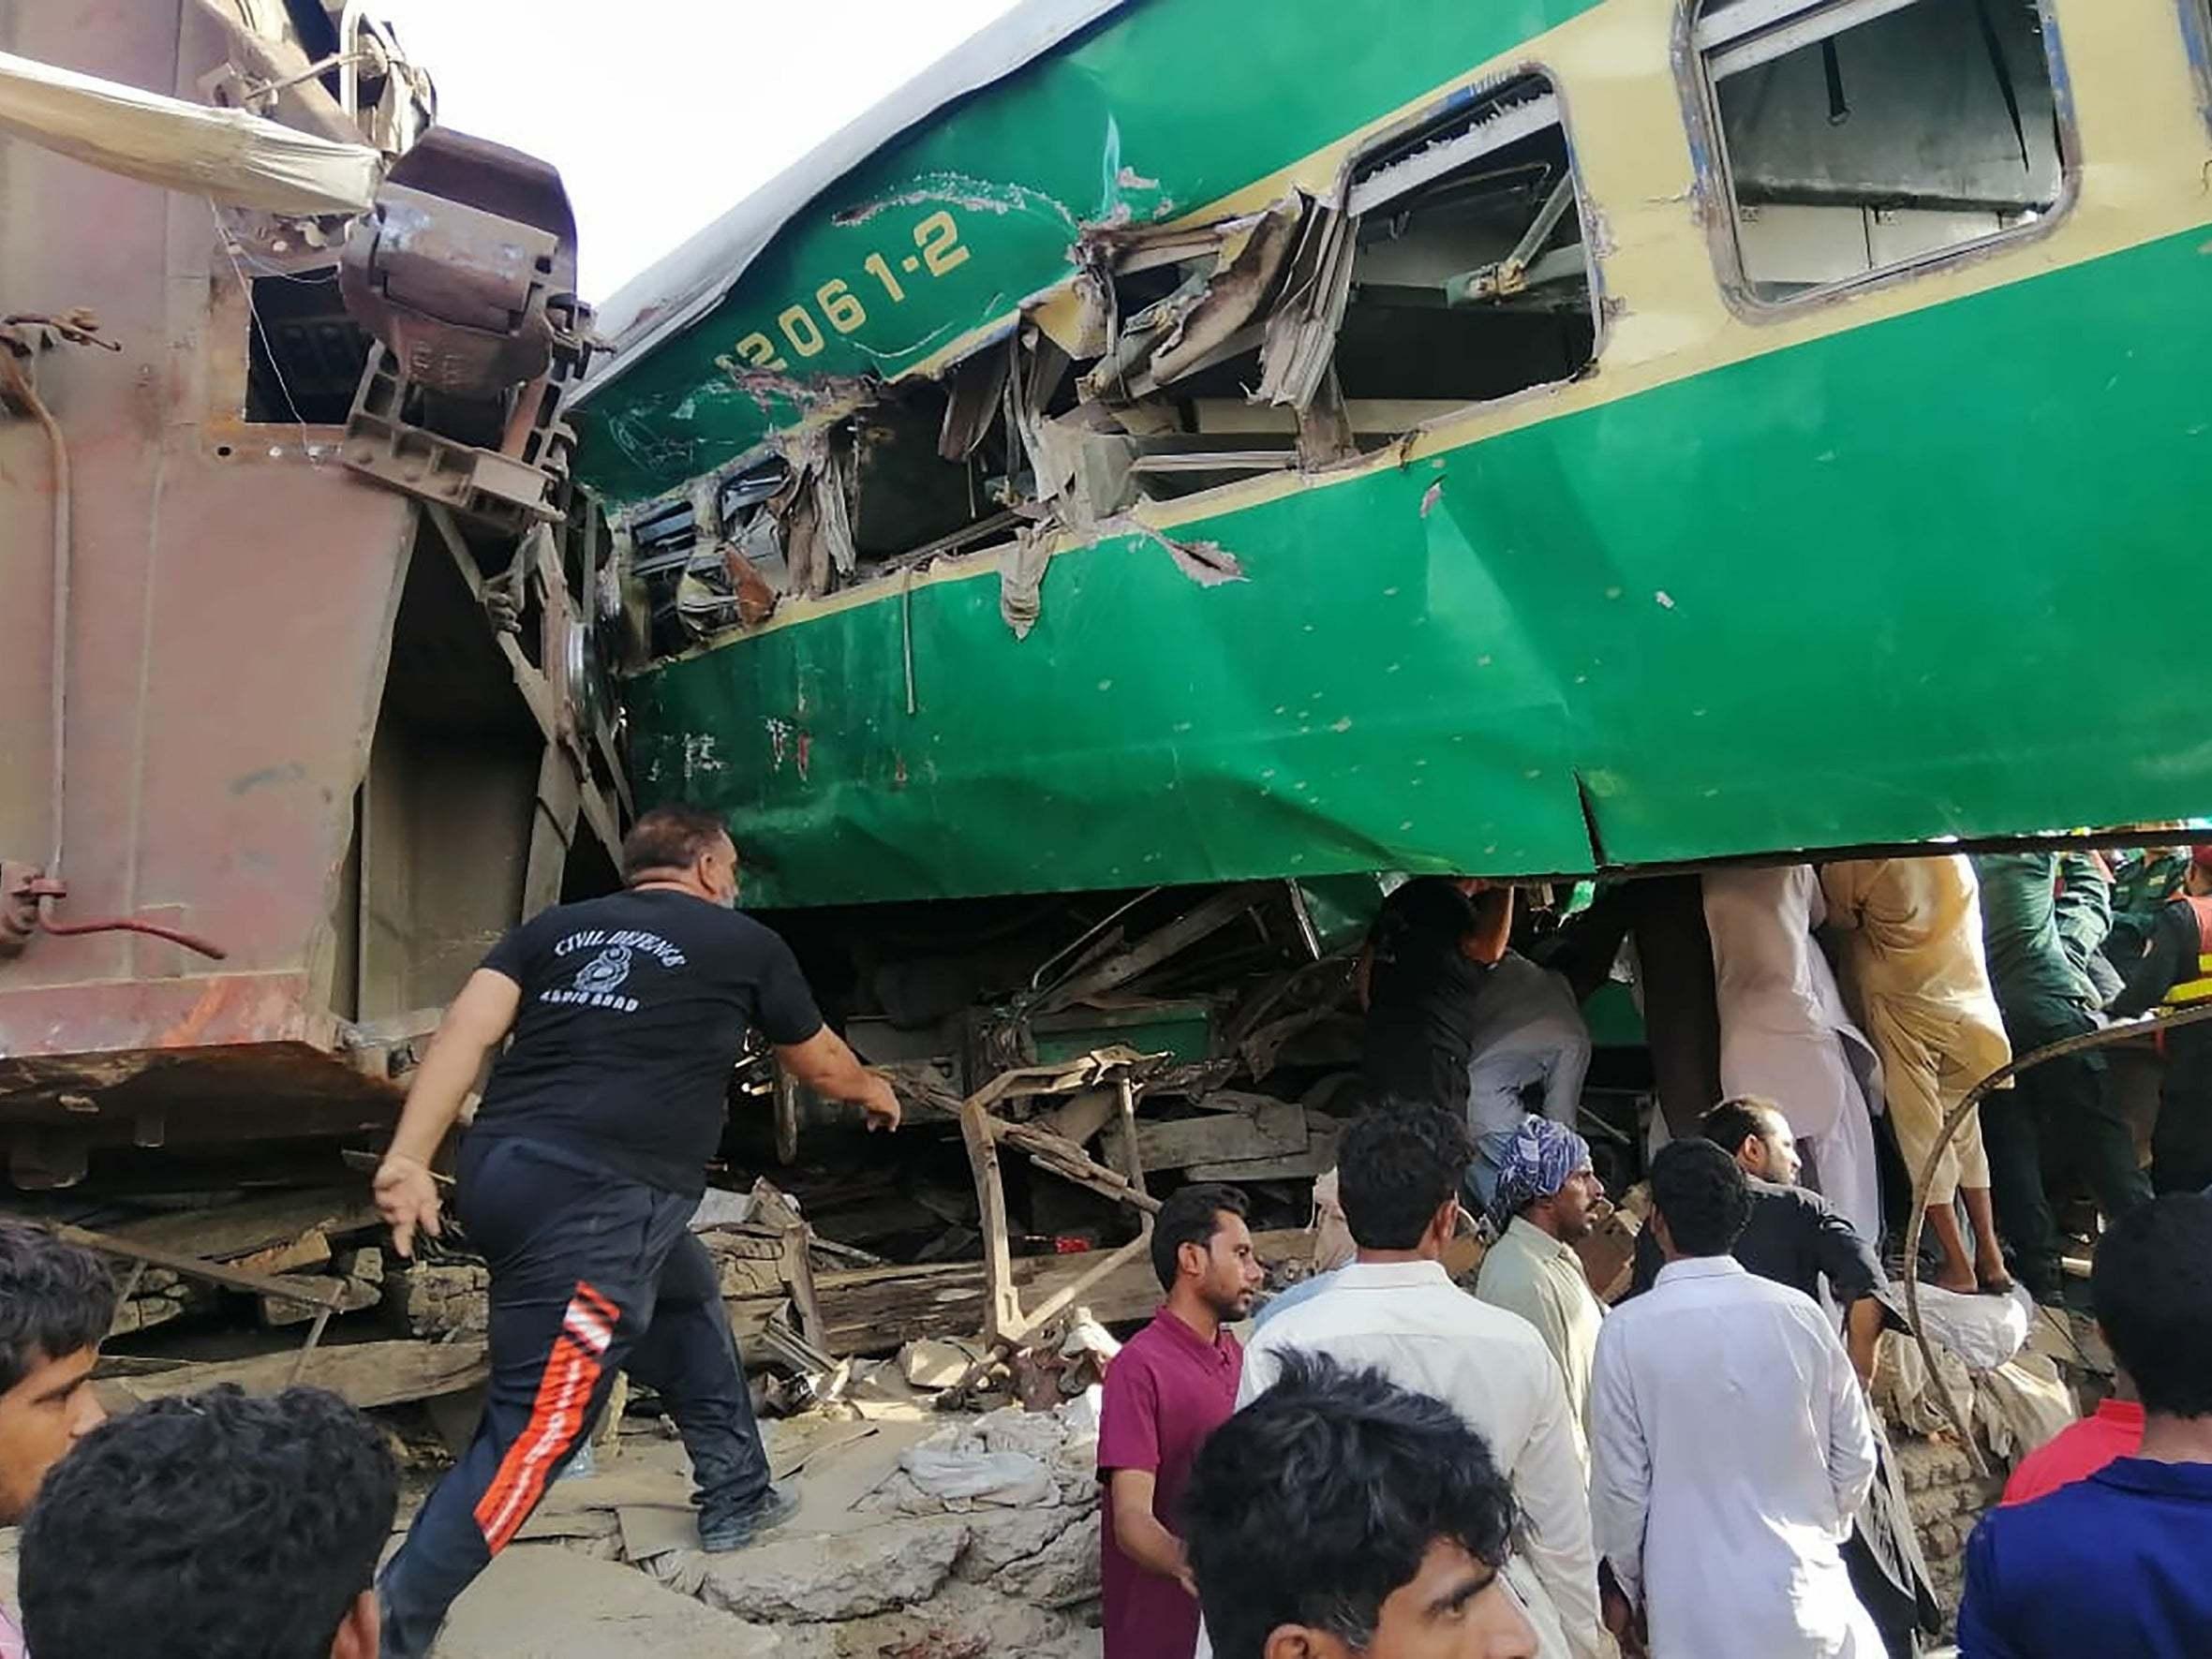 Pakistan train crash: 11 killed as prime minister Imran Khan blames railway 'neglect'